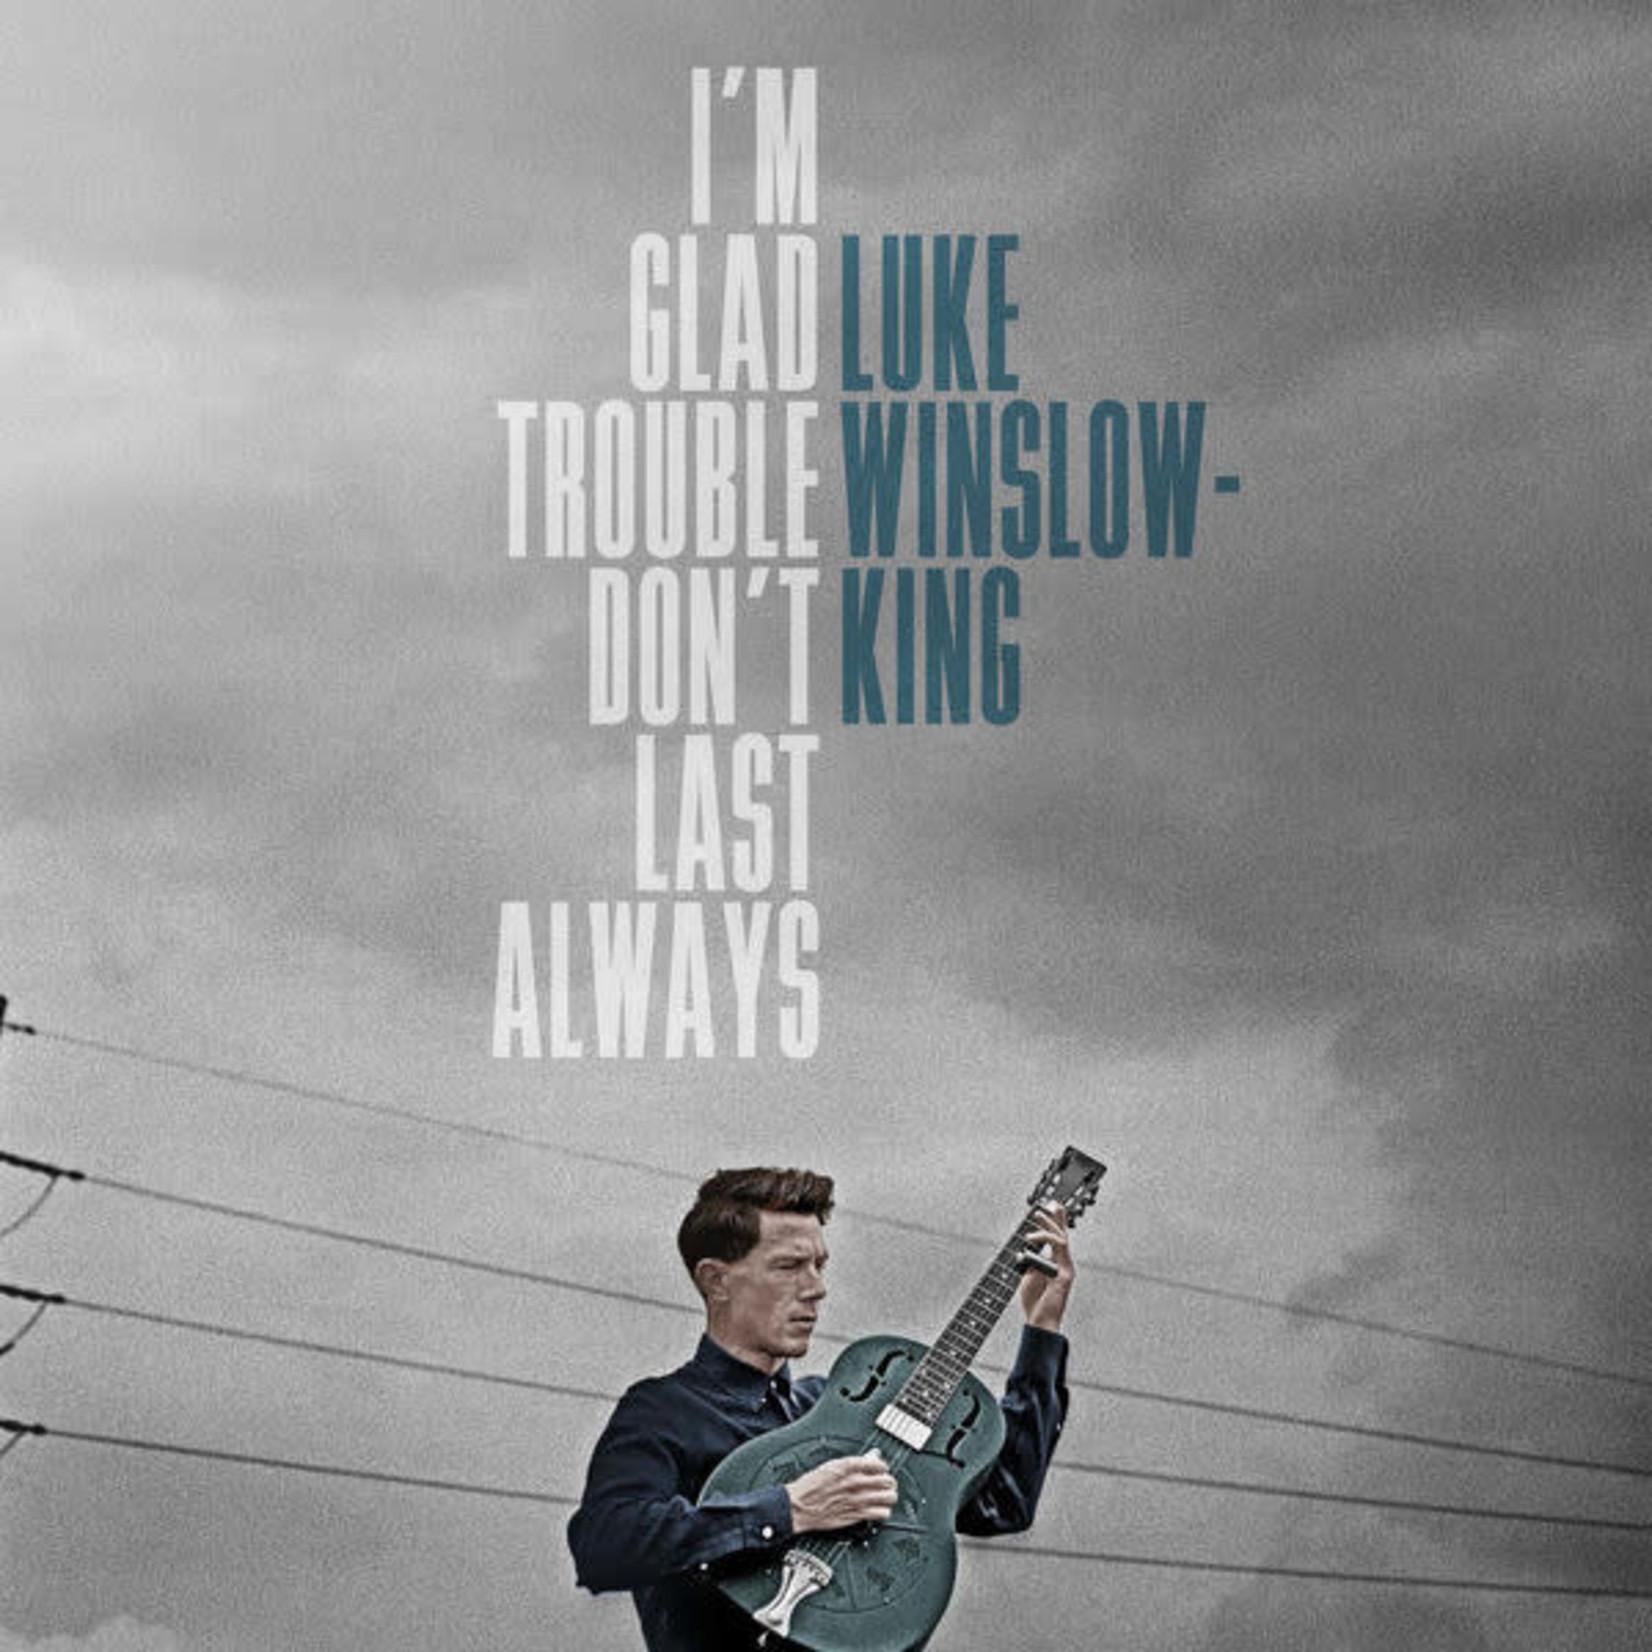 Vinyl Luke Winslow-King - I'm Glad Trouble Don't Last Always